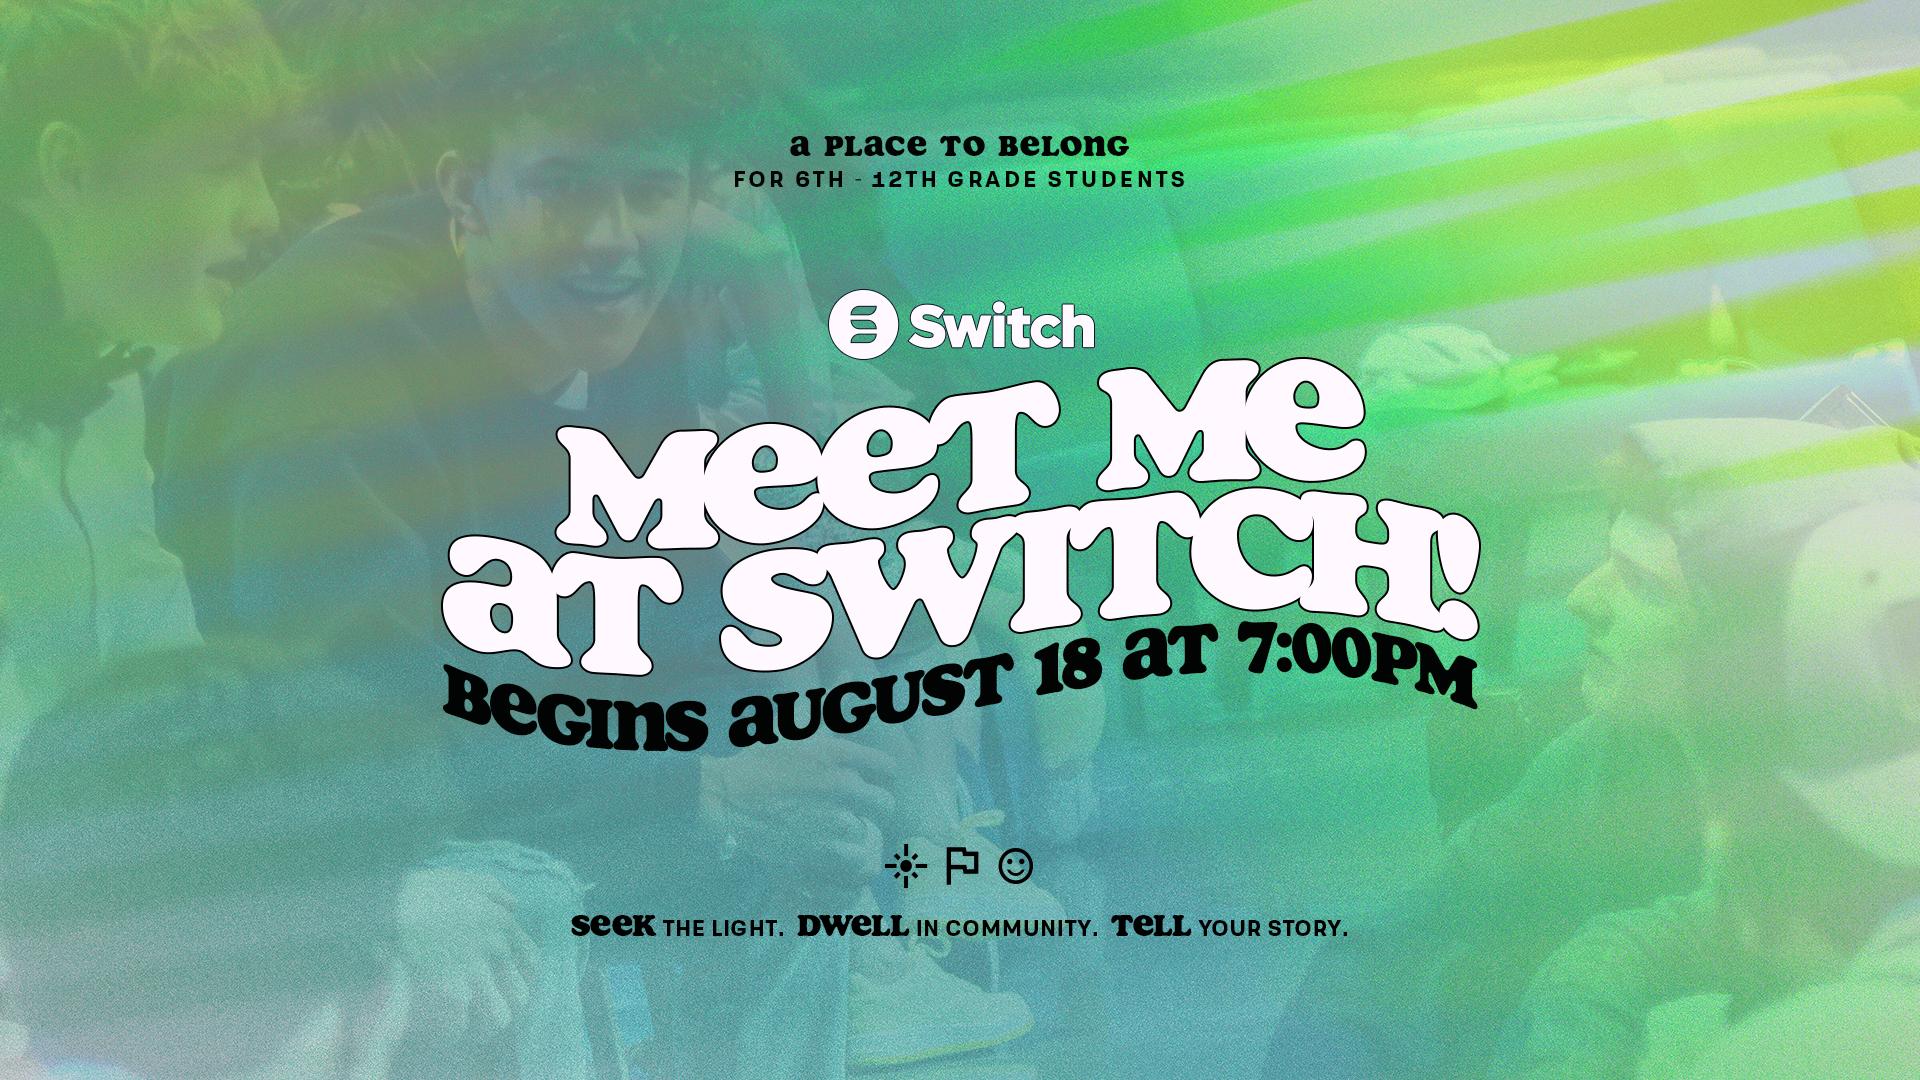 Meet Me at Switch (PSD)